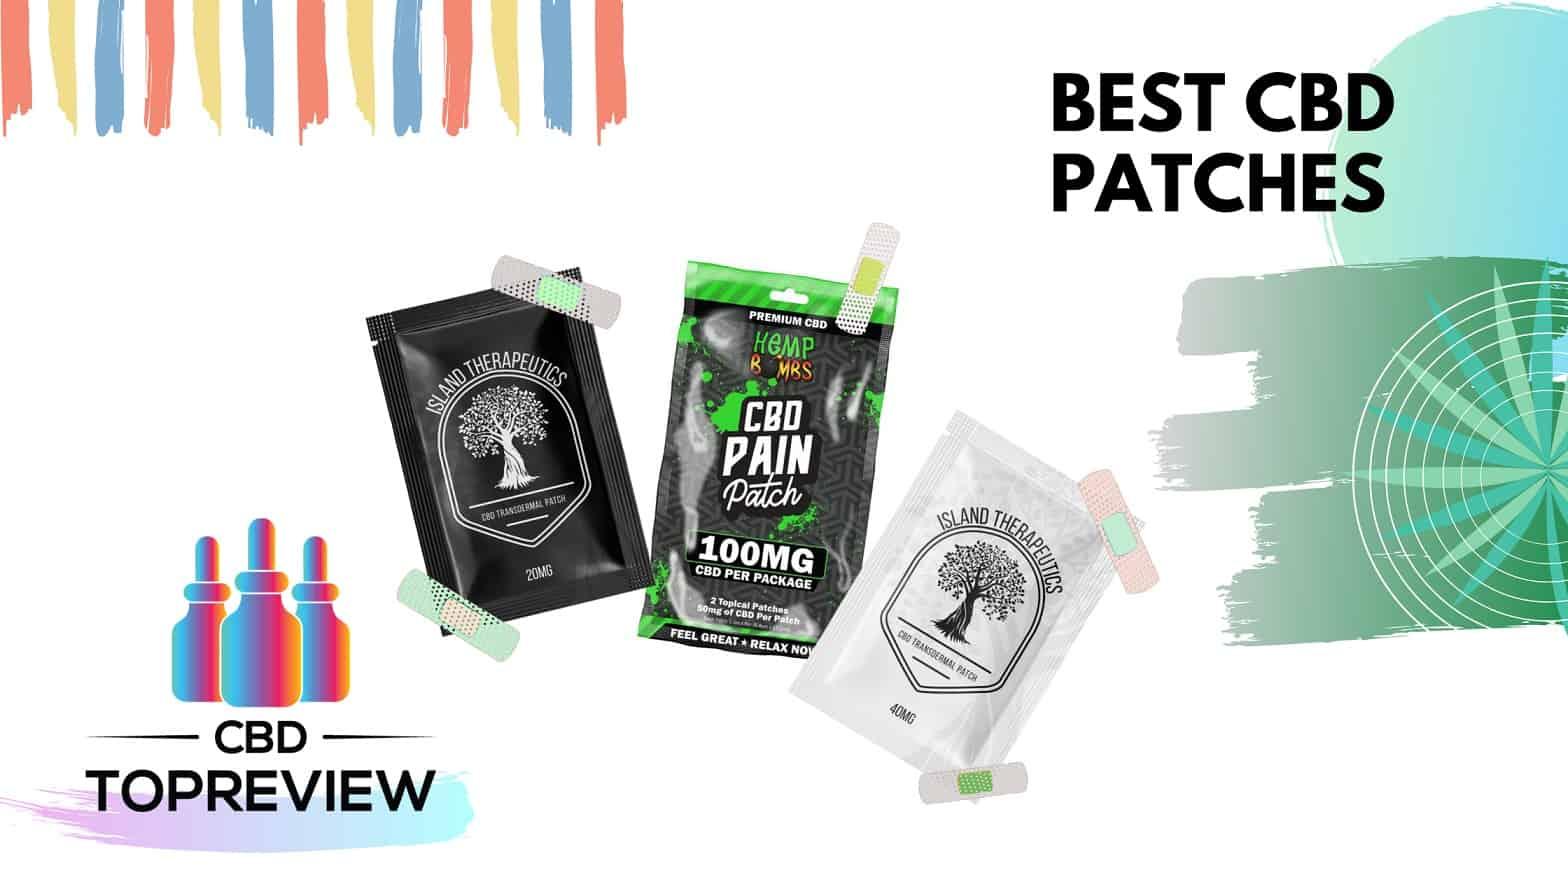 Best CBD Patches